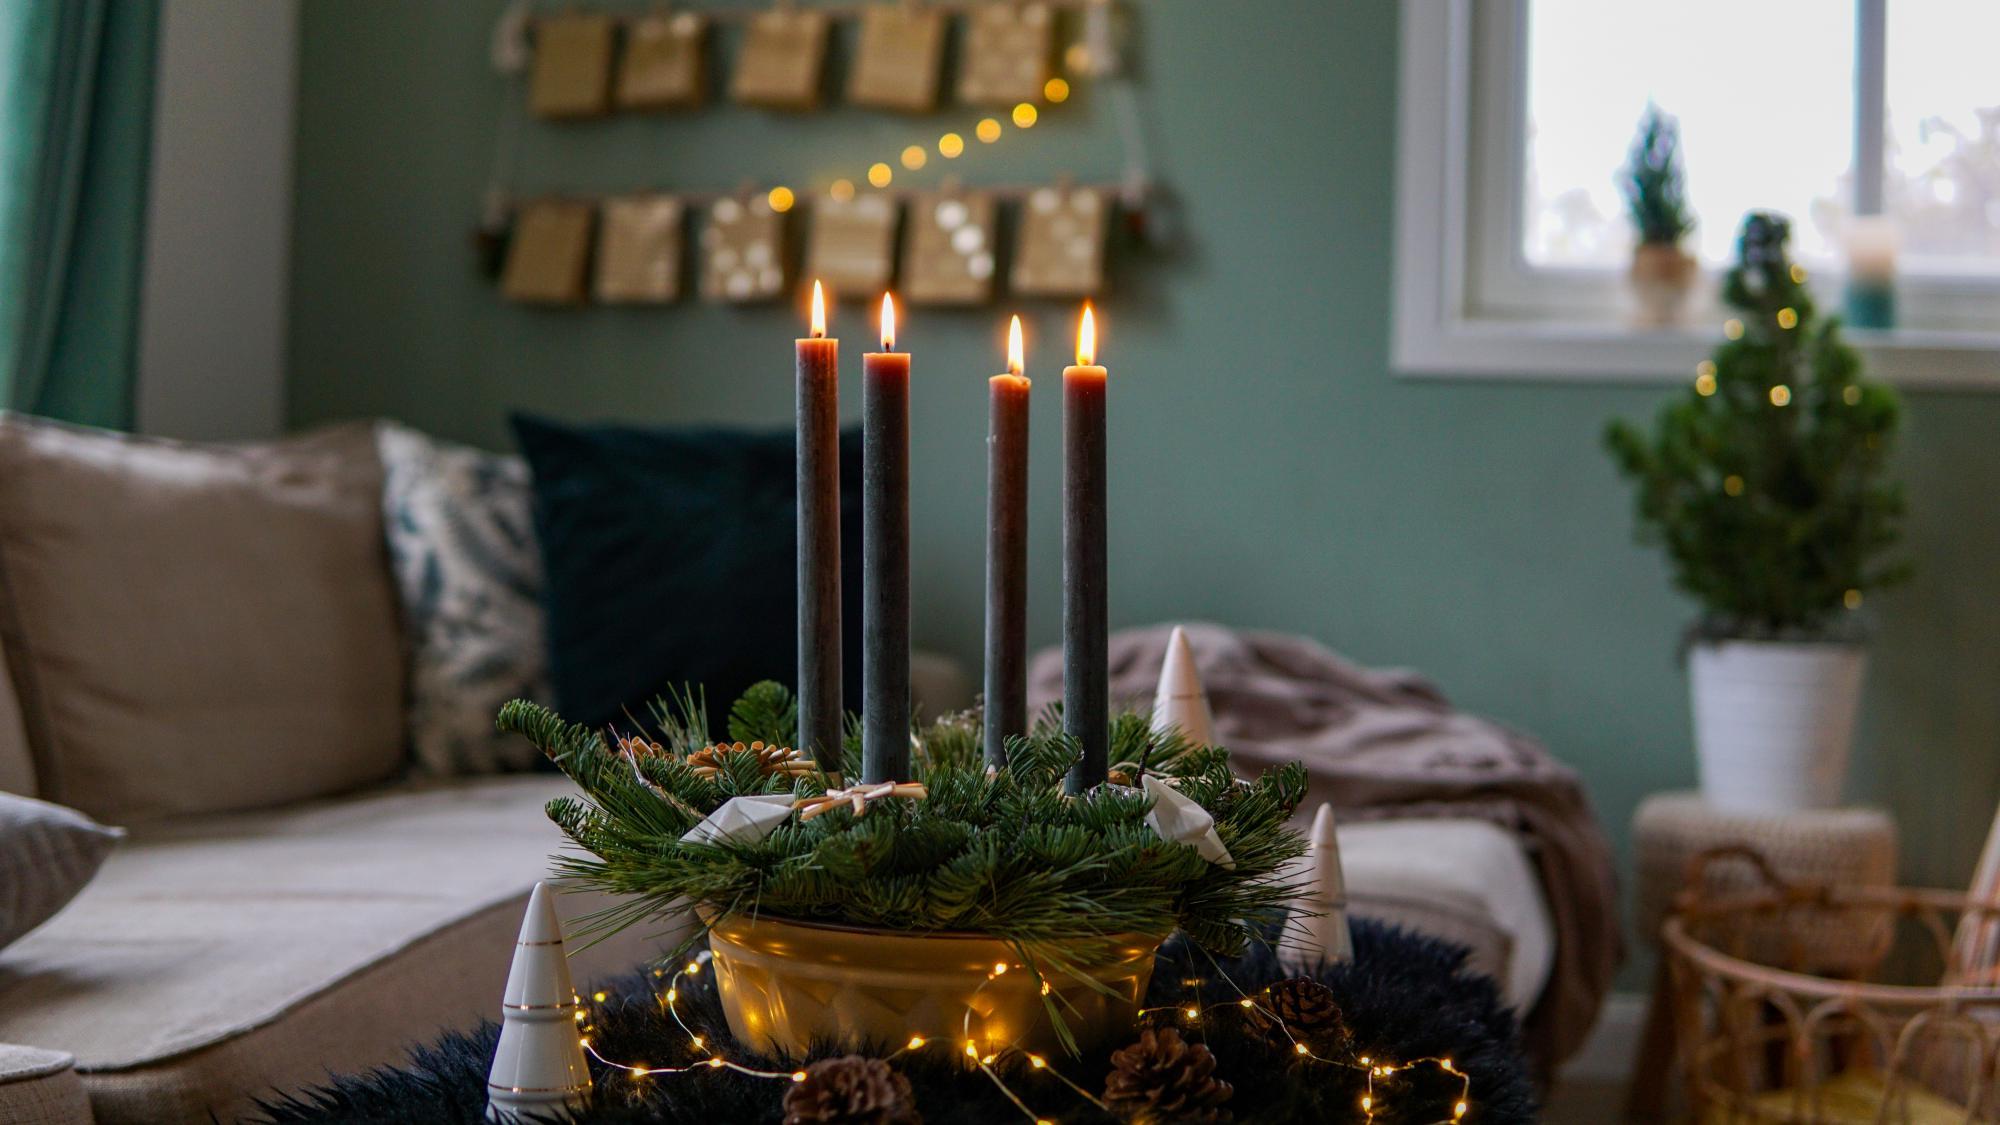 upcycling adventskranz selber machen in einer backform. Black Bedroom Furniture Sets. Home Design Ideas